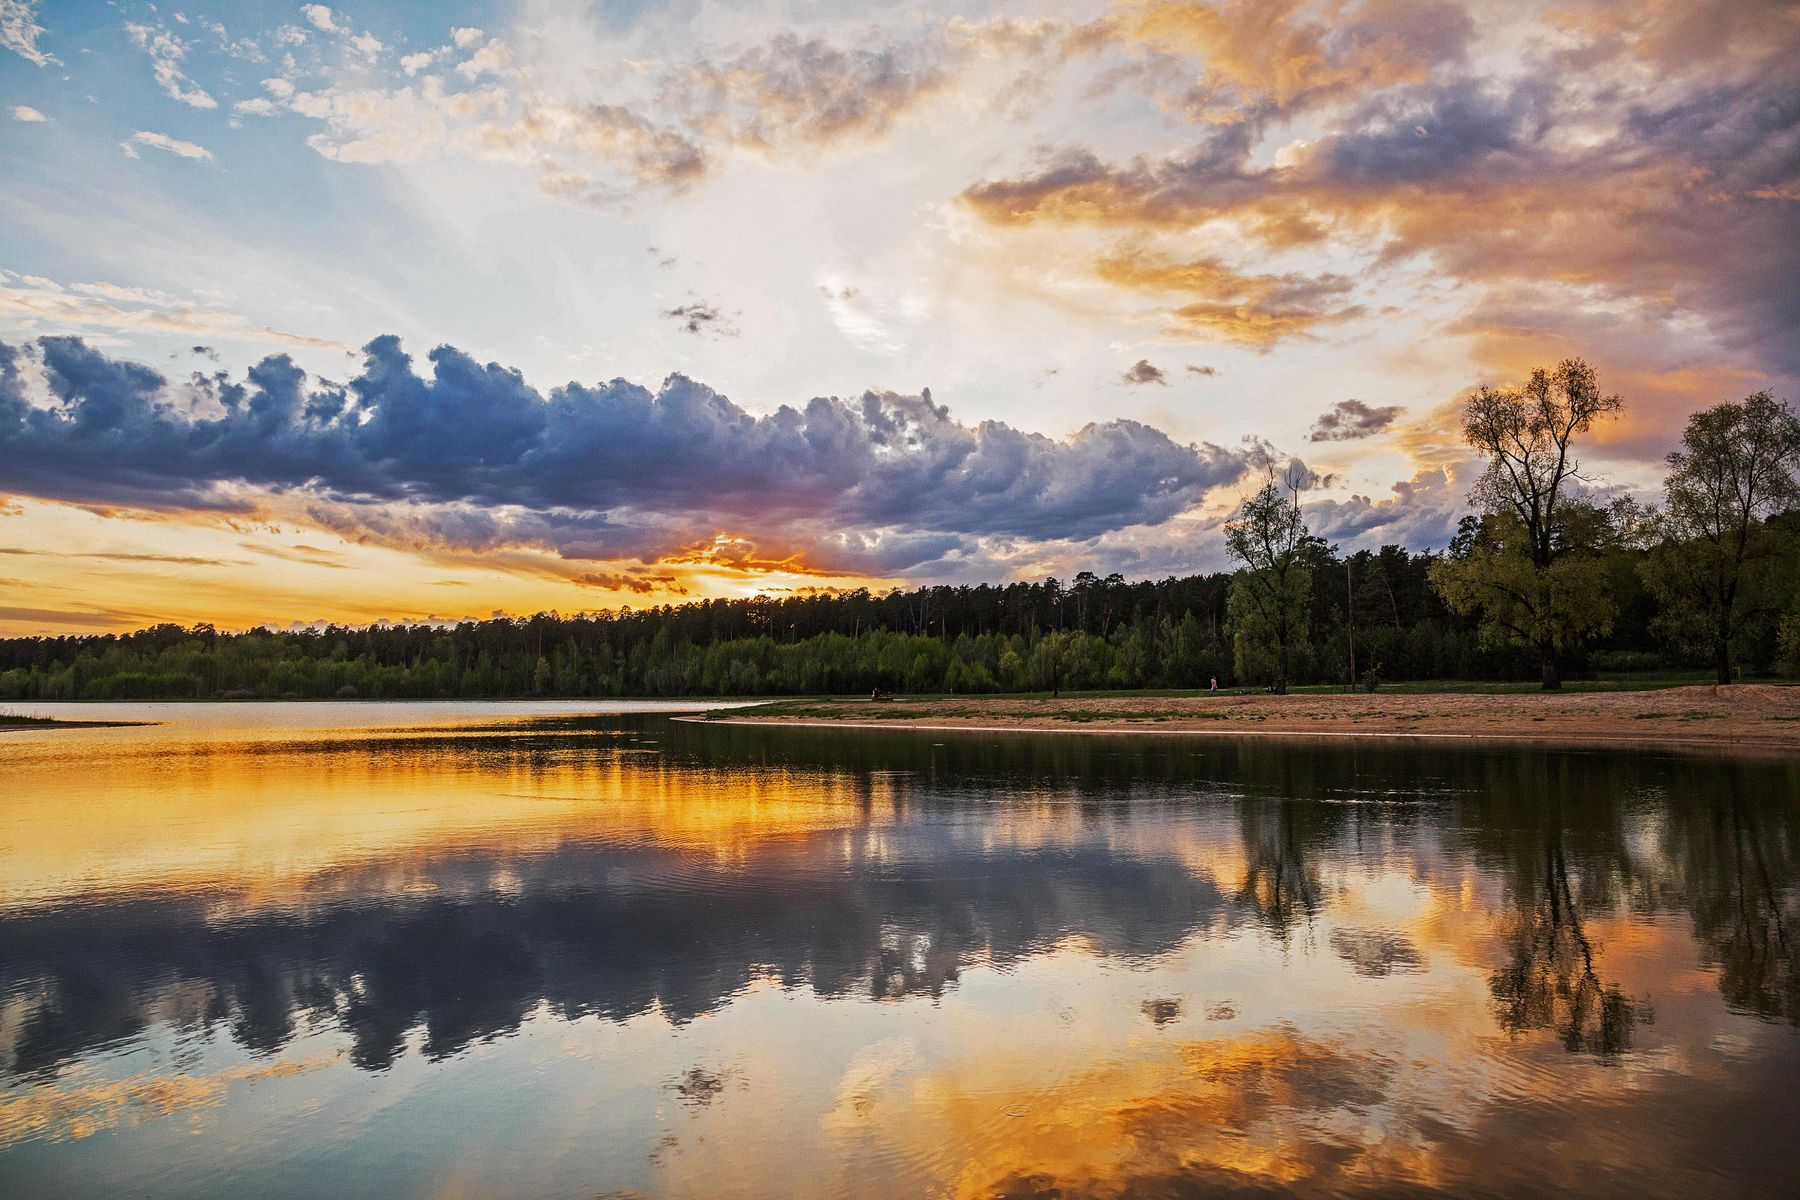 *** природа пейзаж весна вечер закат татарстан озеро большое лебяжье облака